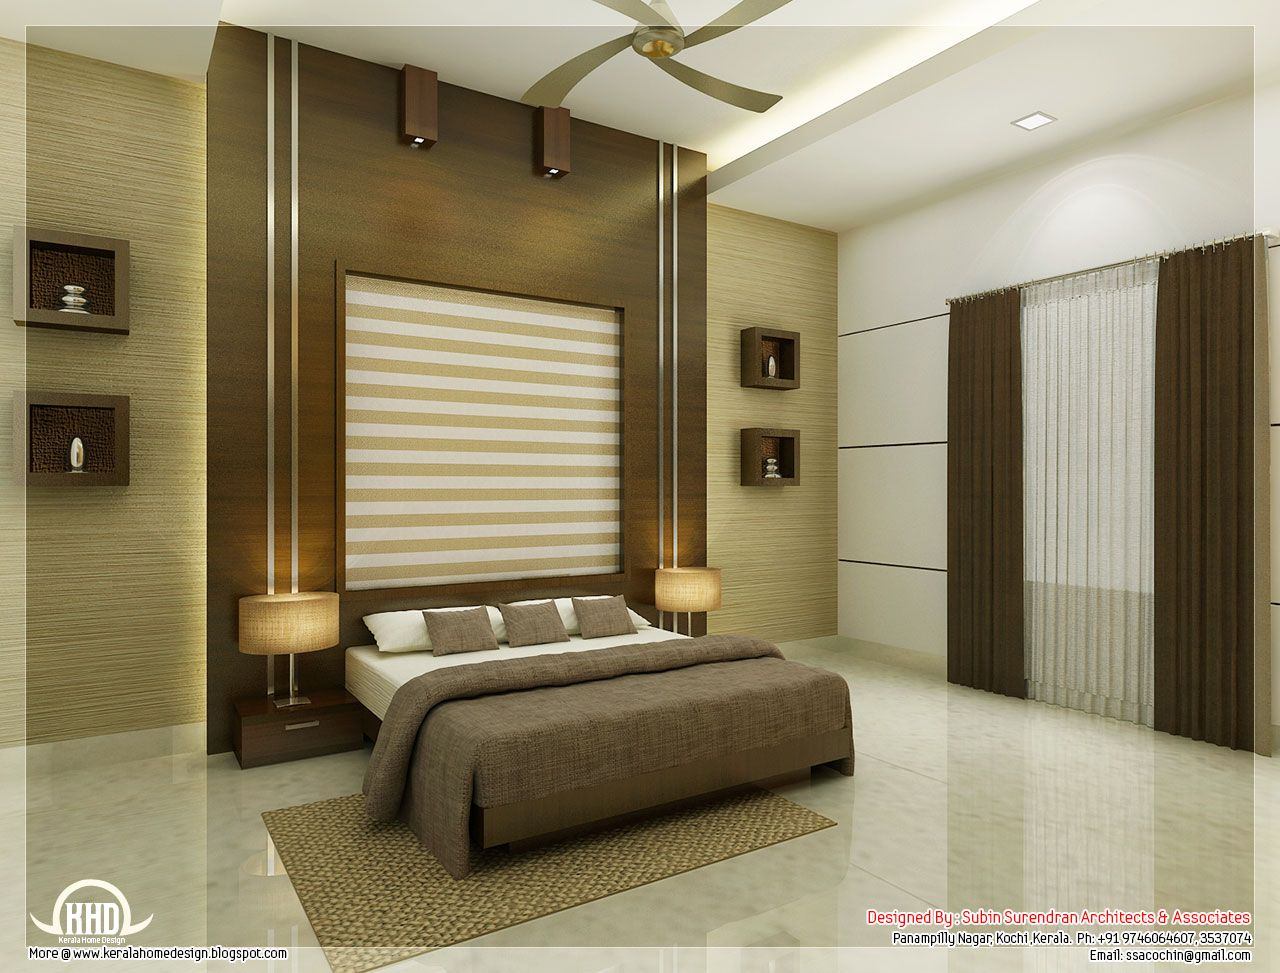 D'life home interiors kochi kerala pin by ellokwork on home interior  pinterest  bedrooms